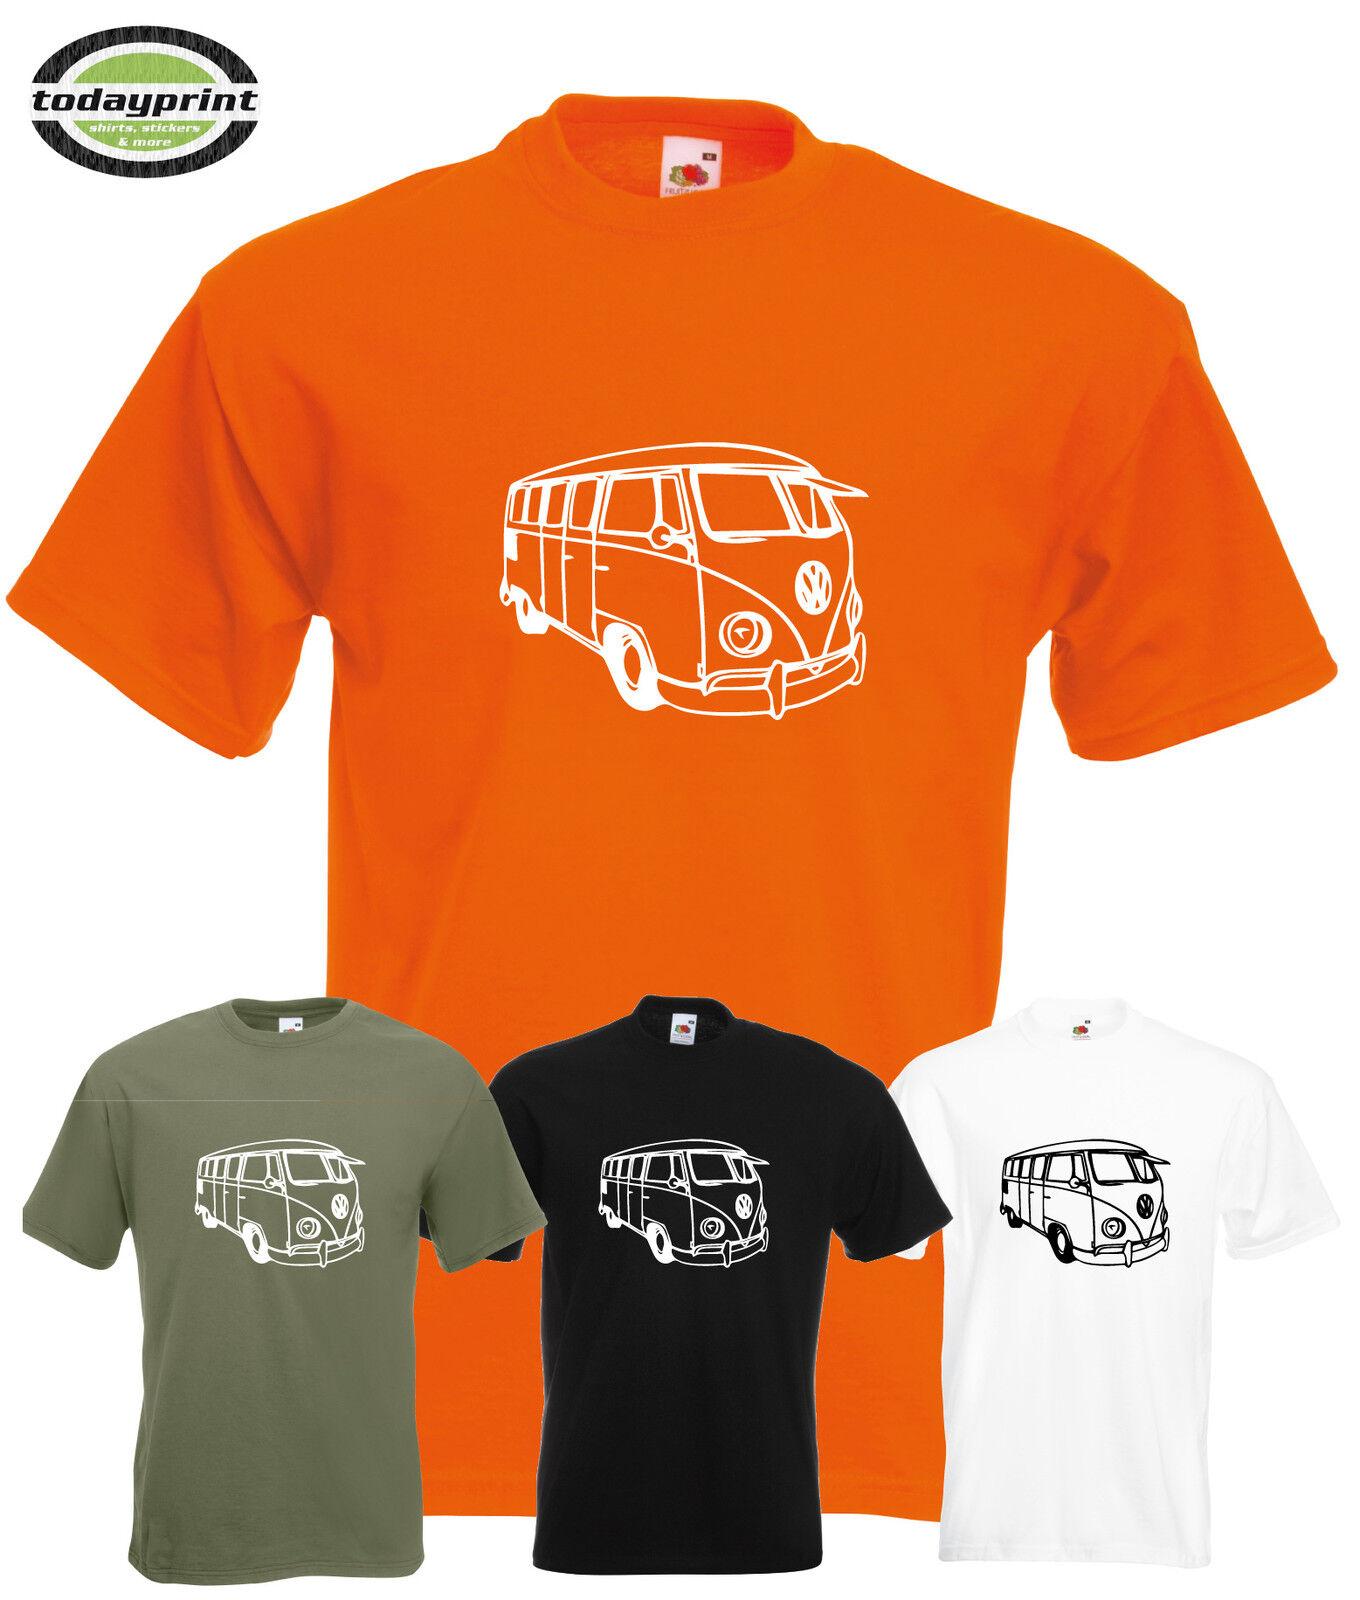 Heavy T Shirt, für VW BUS, T1, T2, T3, Bulli, Transporter, Käfer, Auto, Fans